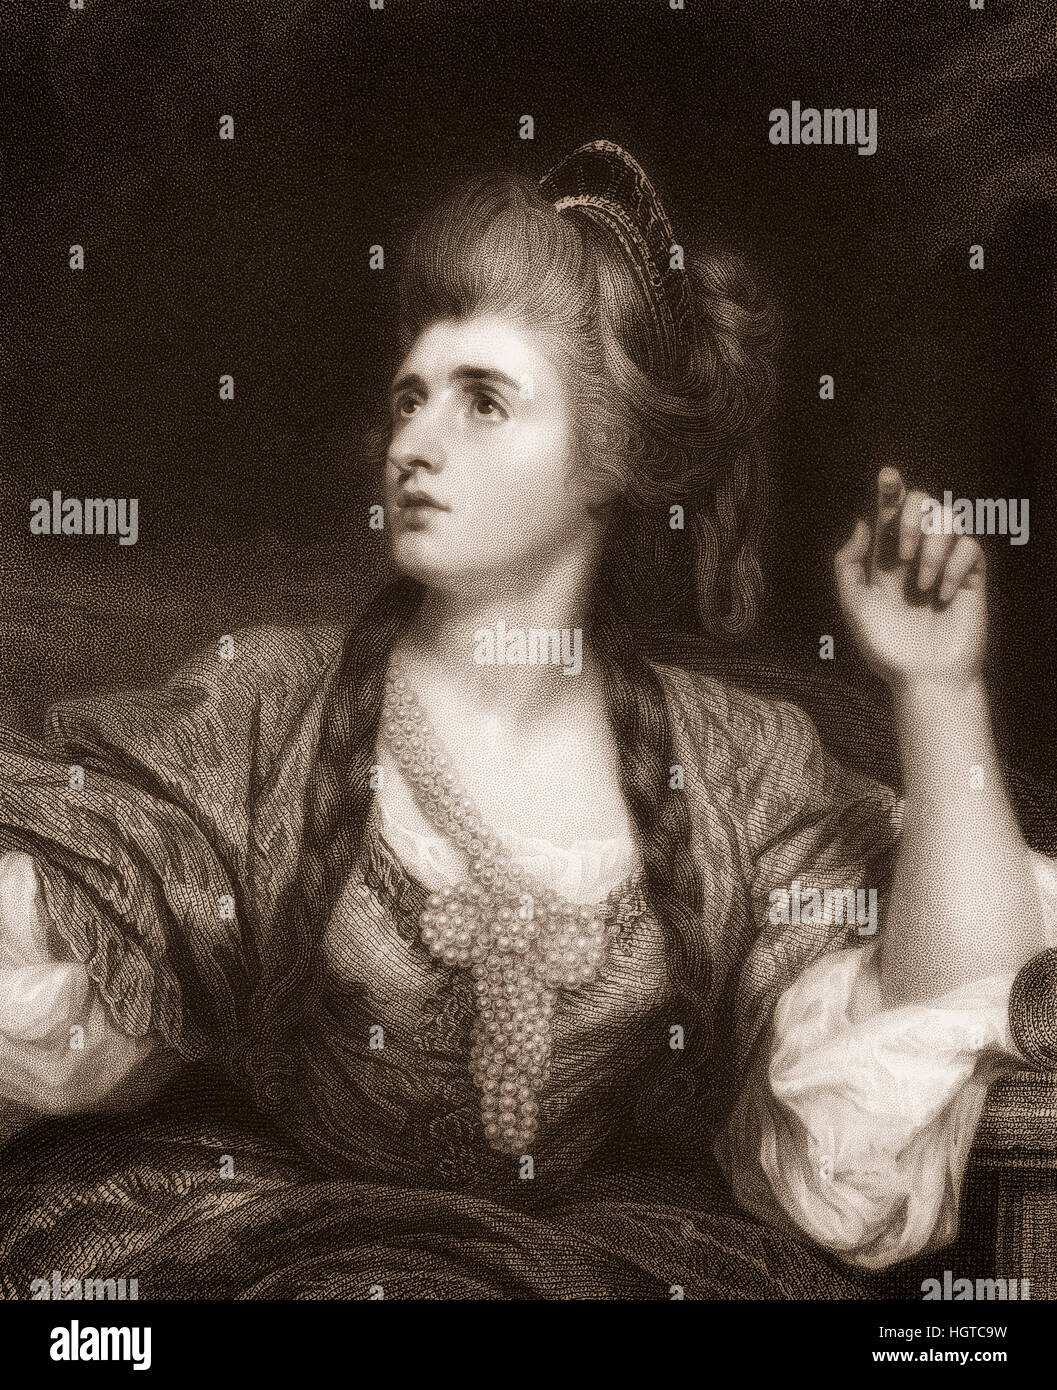 Sarah Siddons, 1755 - 1831, Welsh actress, Portrait von Sarah Siddons, 1755 - 1831, englische Schauspielerin - Stock Image